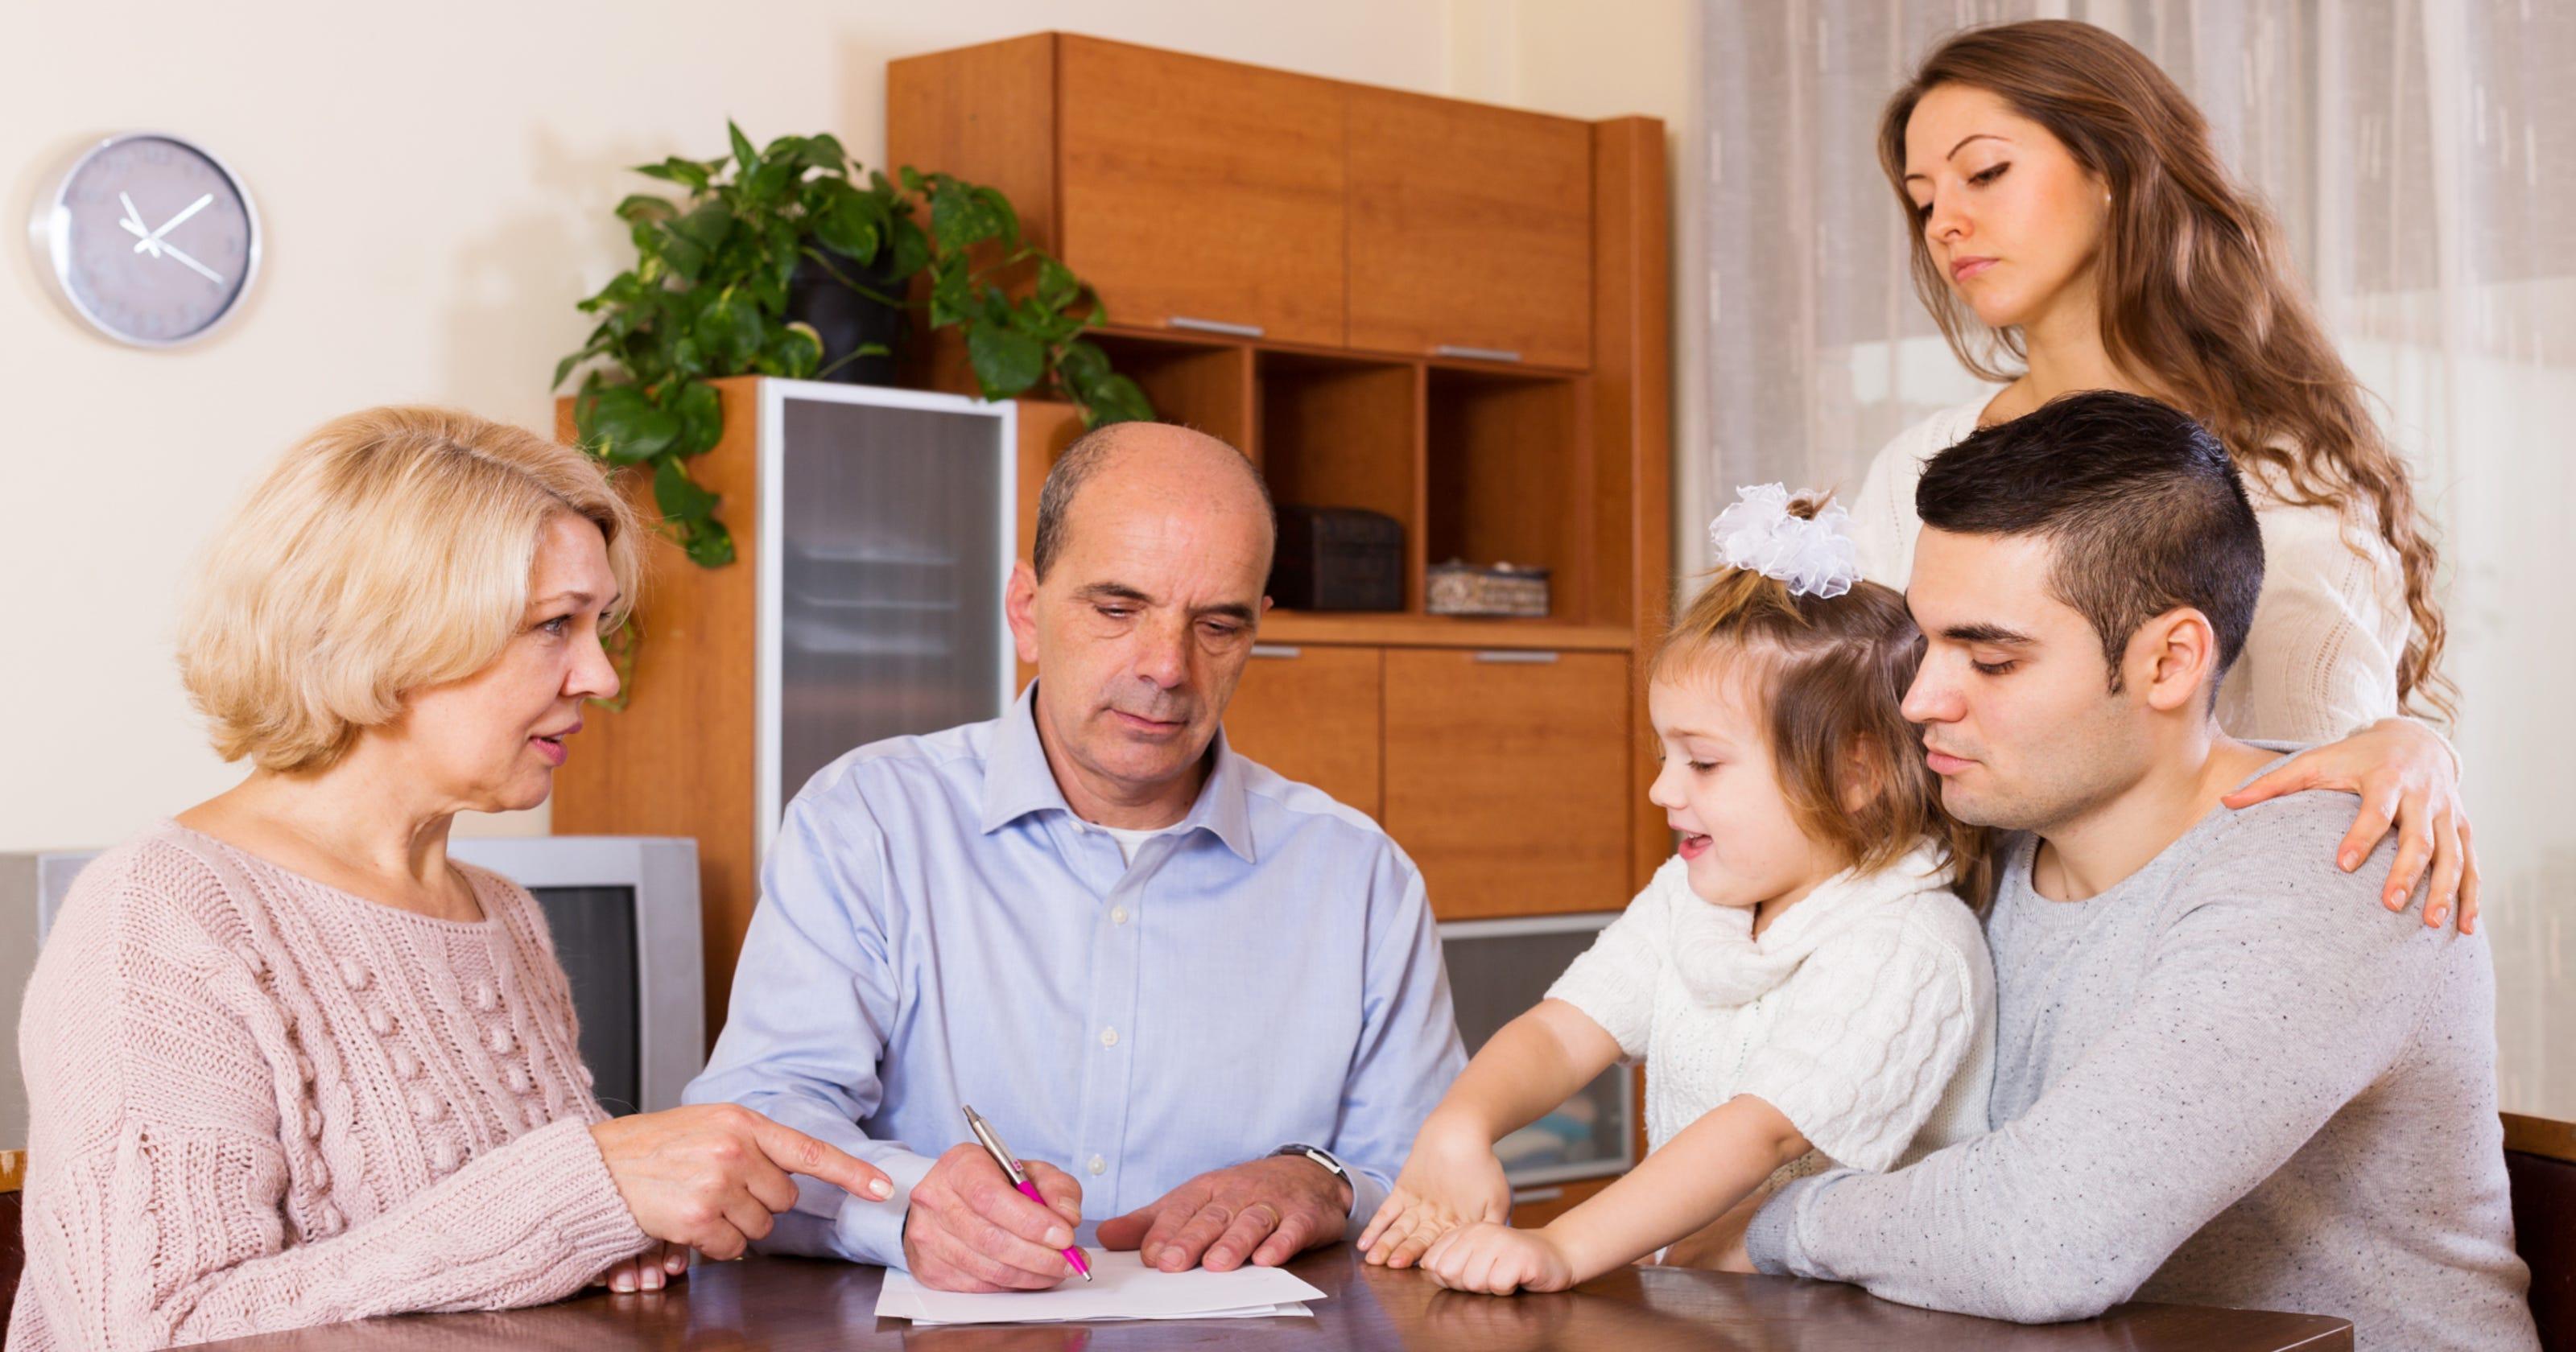 Dear adults who mooch off parents: Grow up